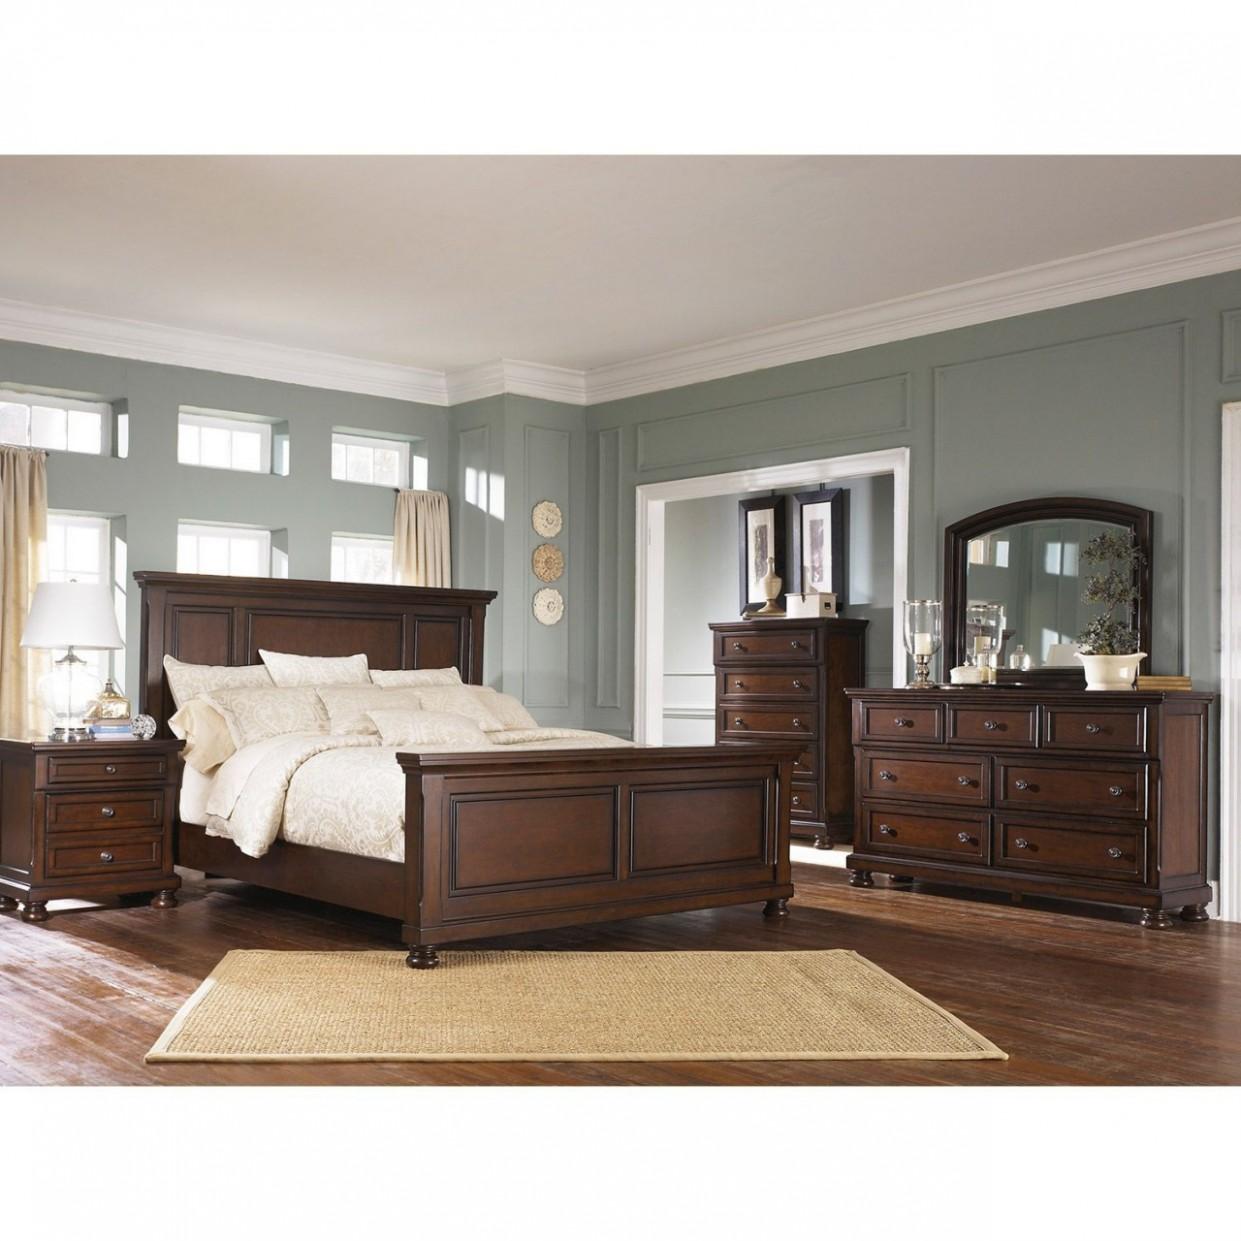 "Unique Wall Art Decor – Decor Art from ""Unique Wall Art Decor  - Bedroom Ideas With Oak Furniture"